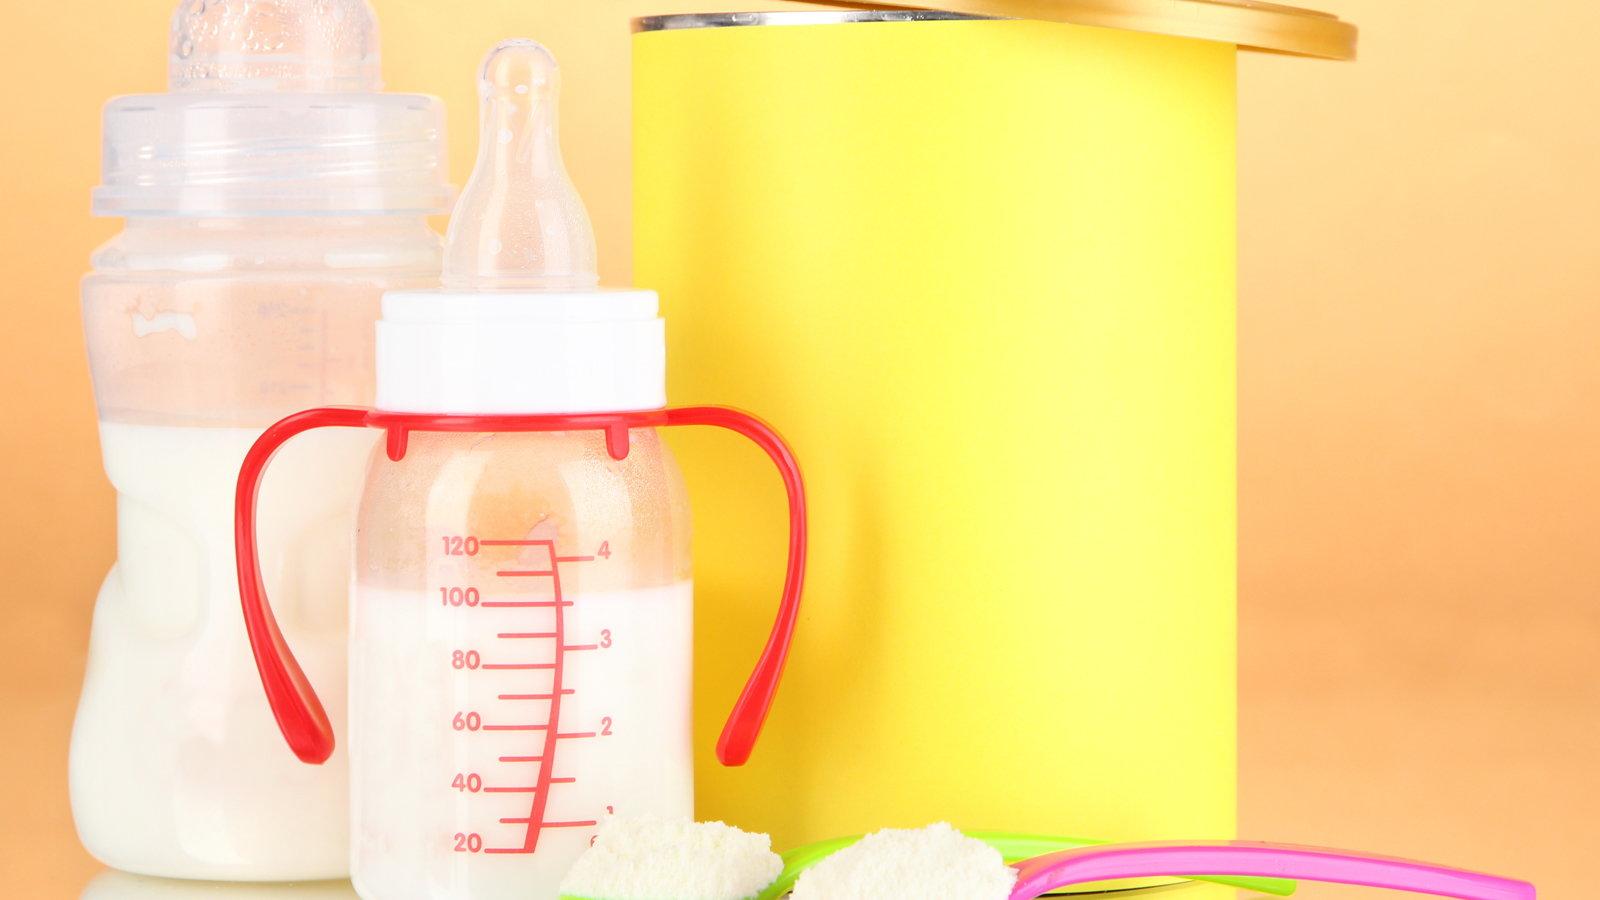 baby bottles with infant formula